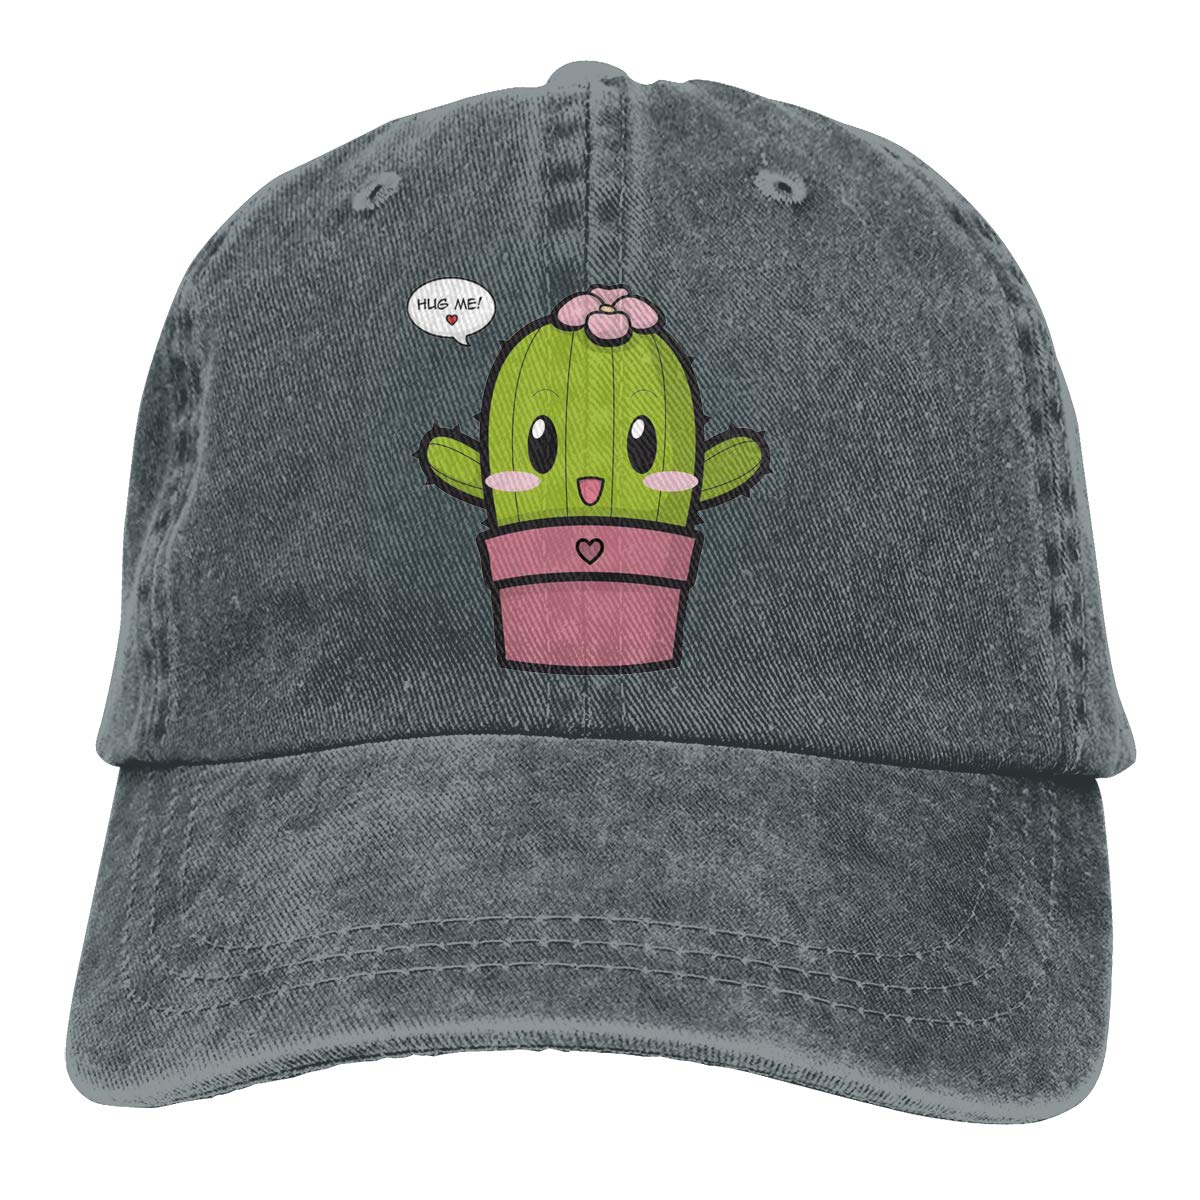 Qbeir Adult Unisex Cowboy Cap Adjustable Hat Hug Me Cactus Cotton Denim